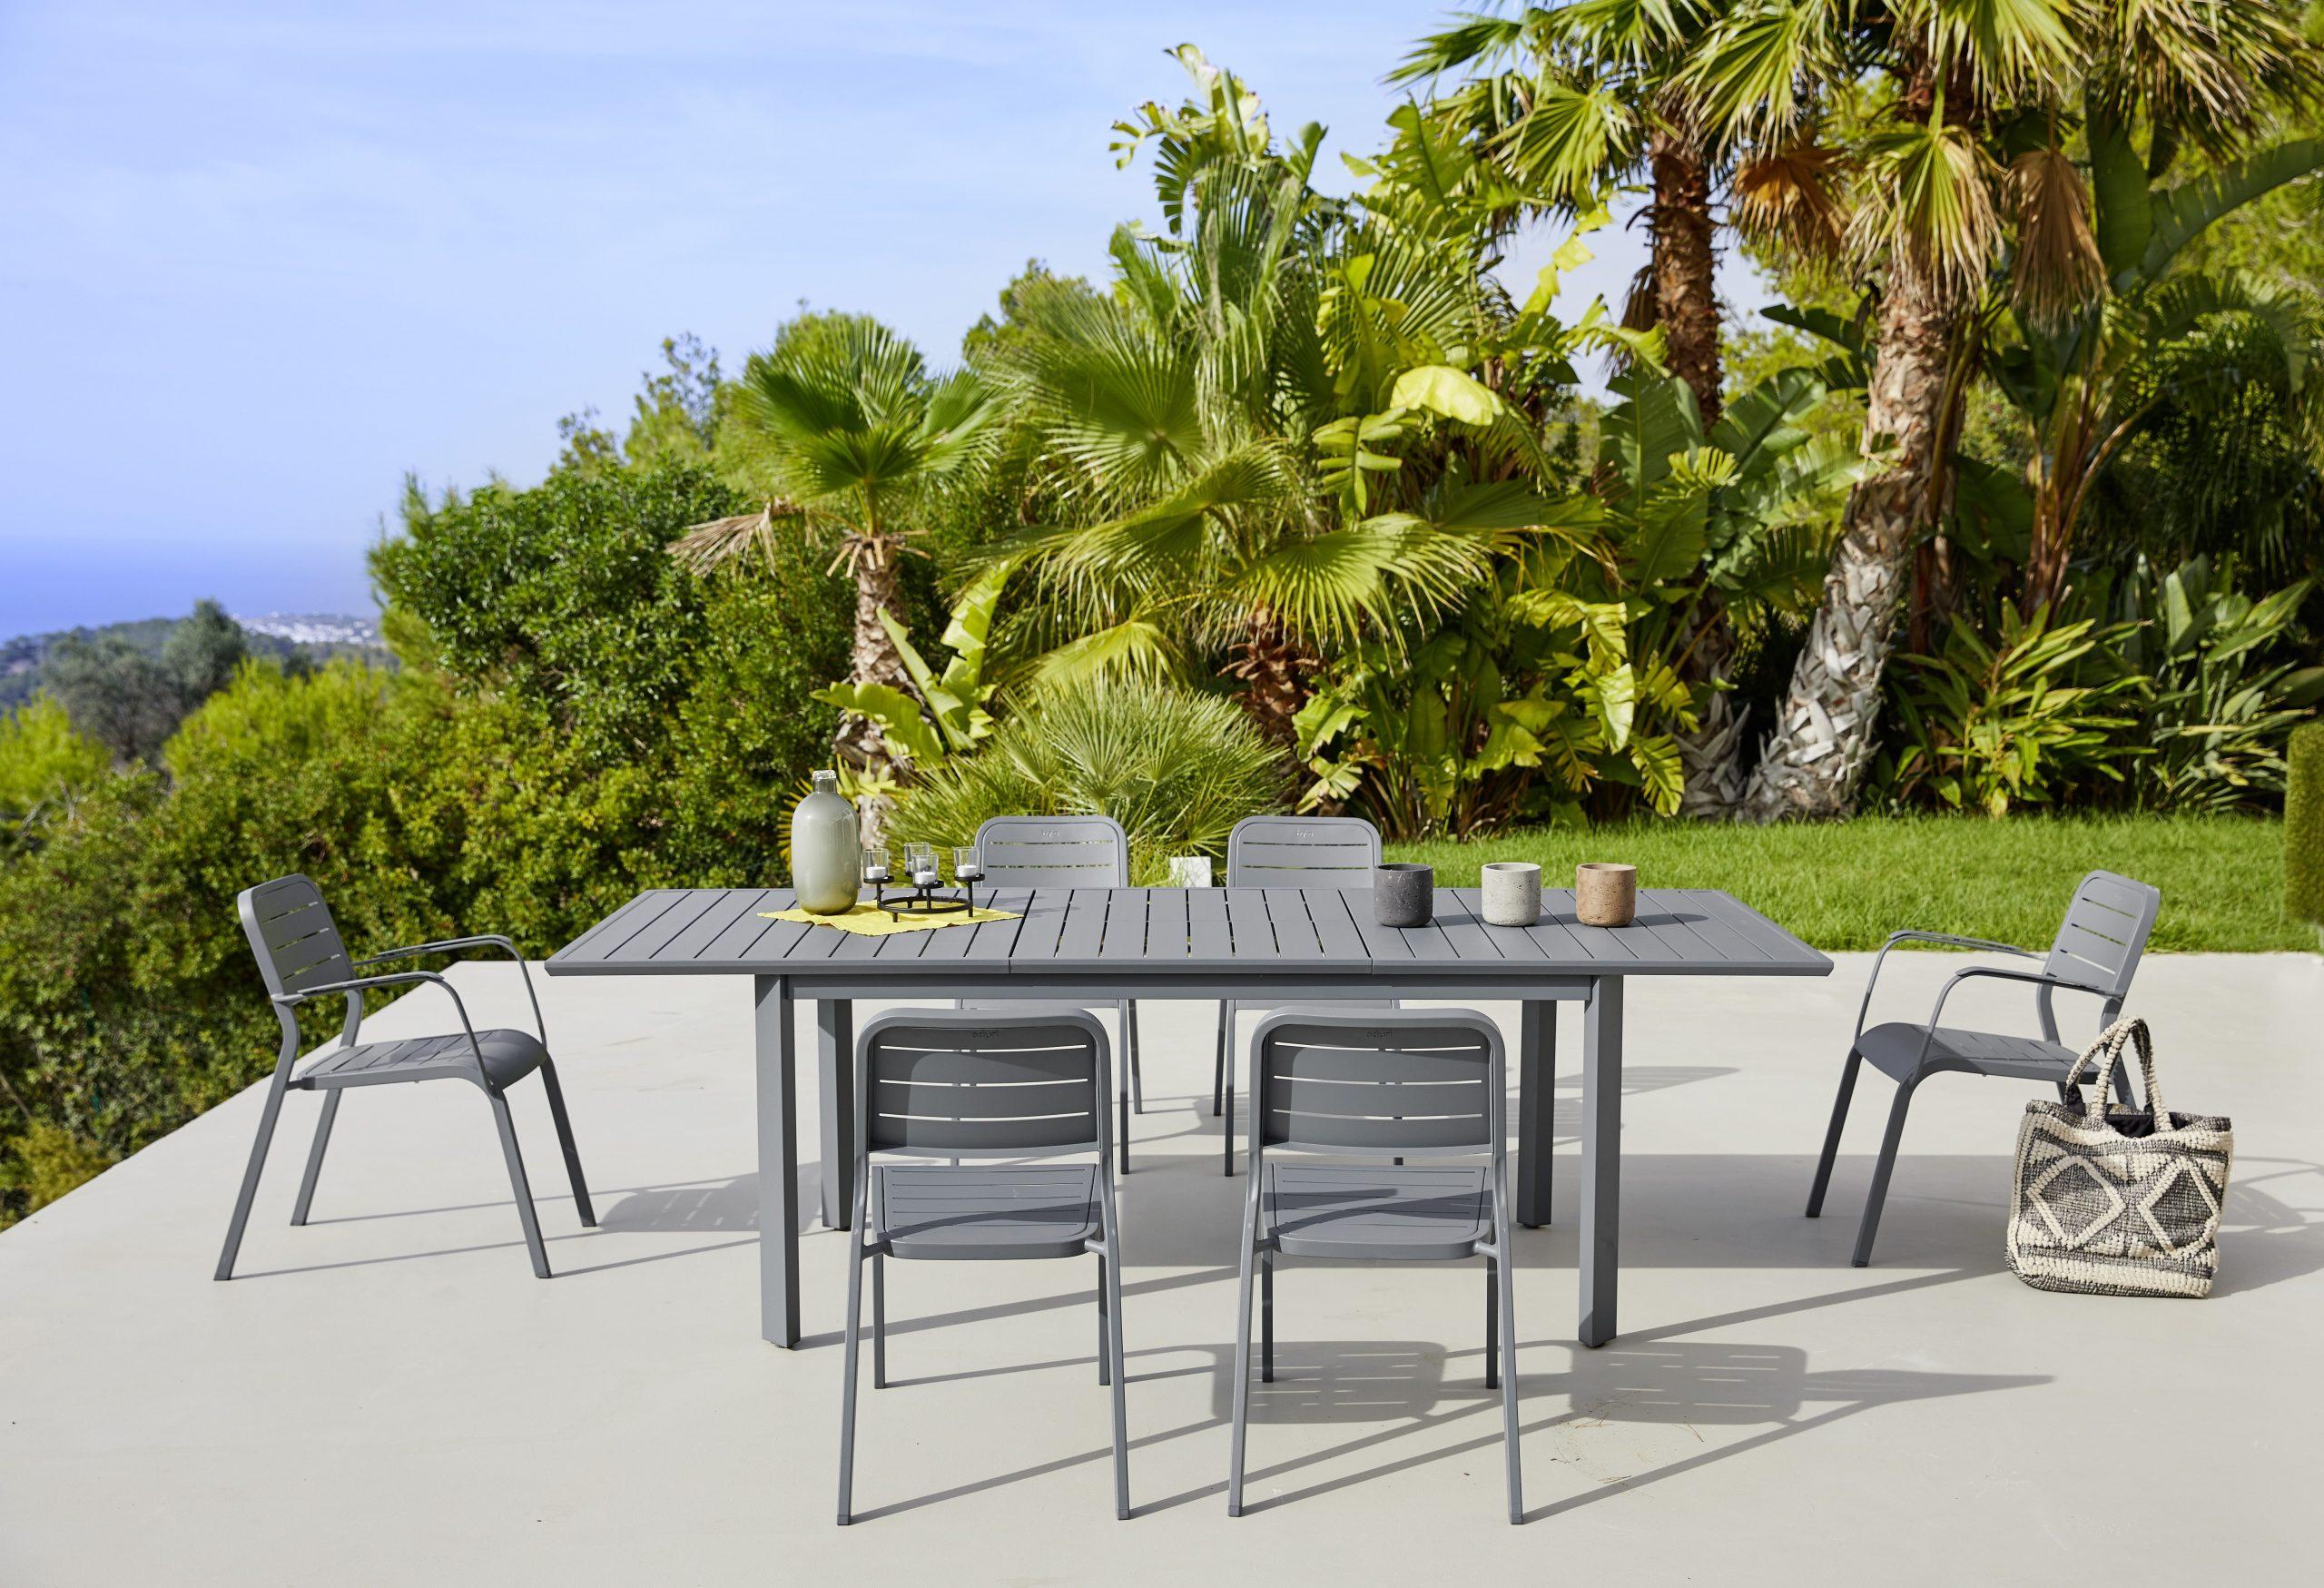 Evenements Jardin | Table De Jardin Alu, Mobilier Jardin Et ... serapportantà Table Et Chaise De Jardin Carrefour